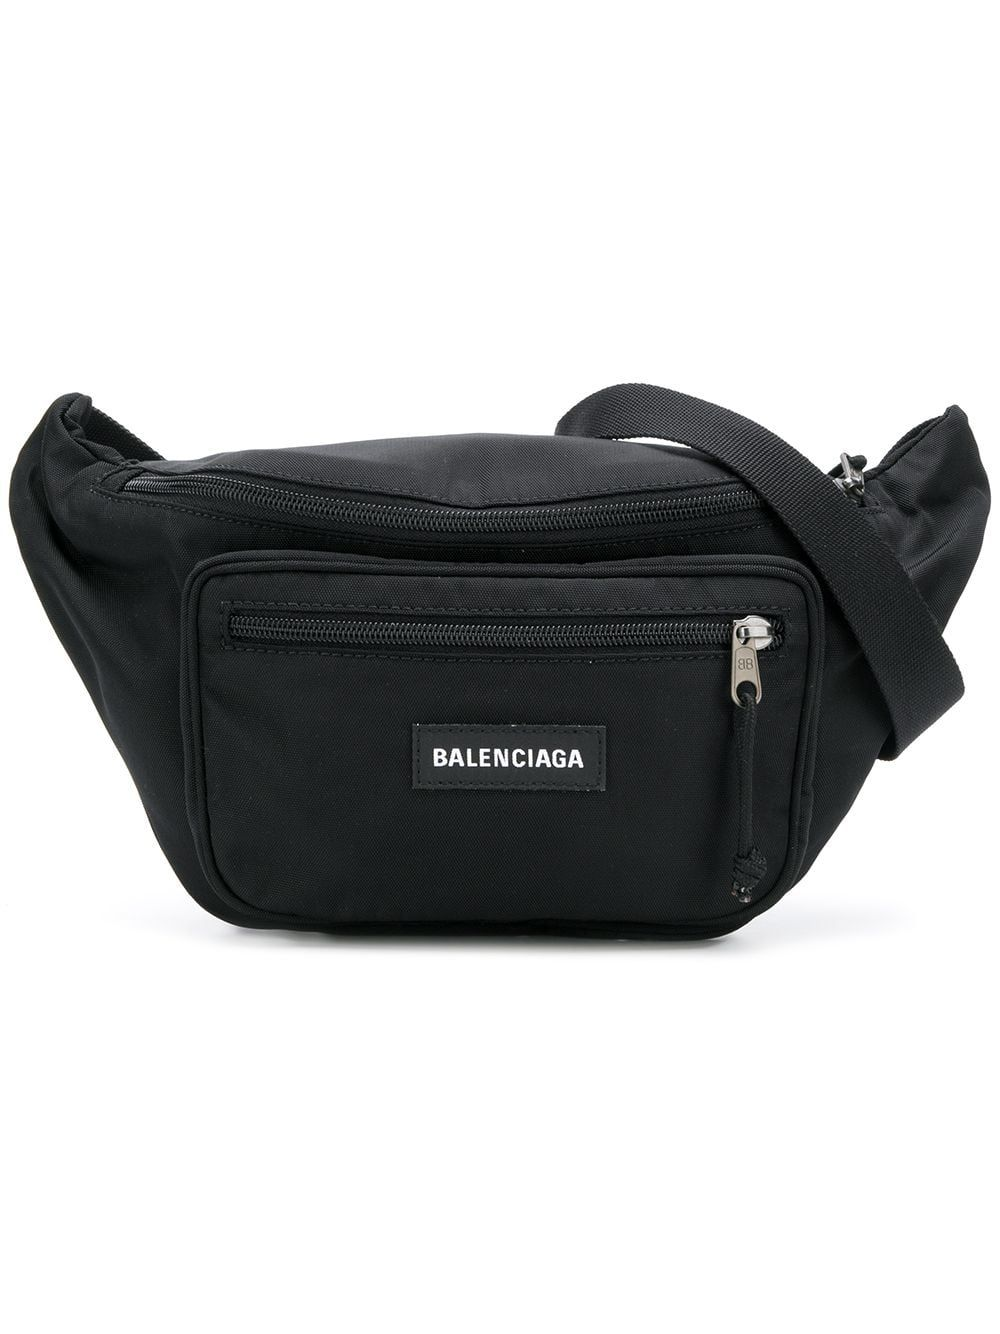 489b442848b2 BALENCIAGA BALENCIAGA EXPLORER BELT PACK - BLACK.  balenciaga  bags  belt  bags